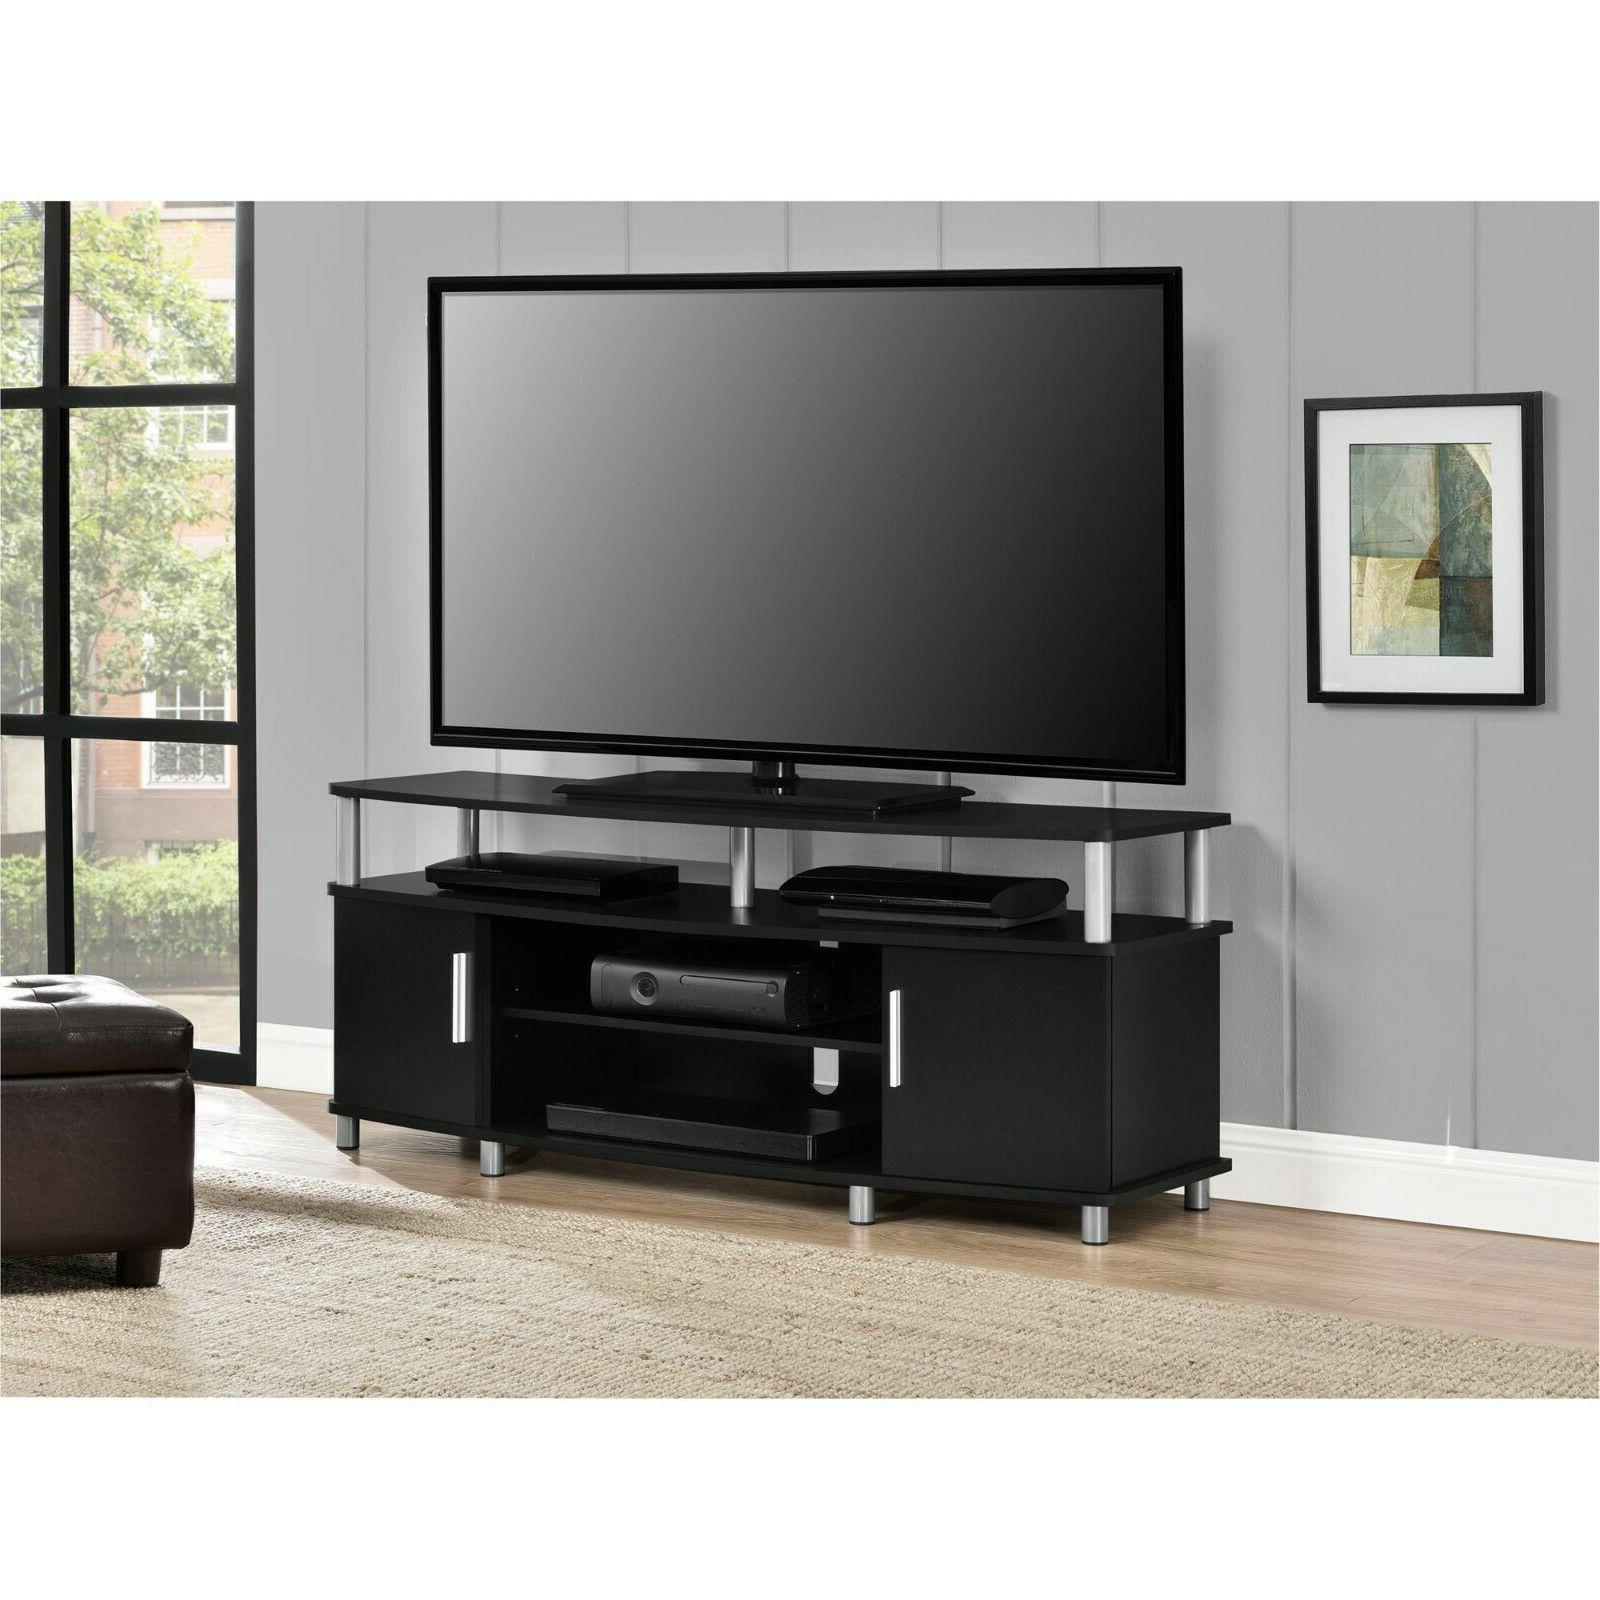 tv stand console media center